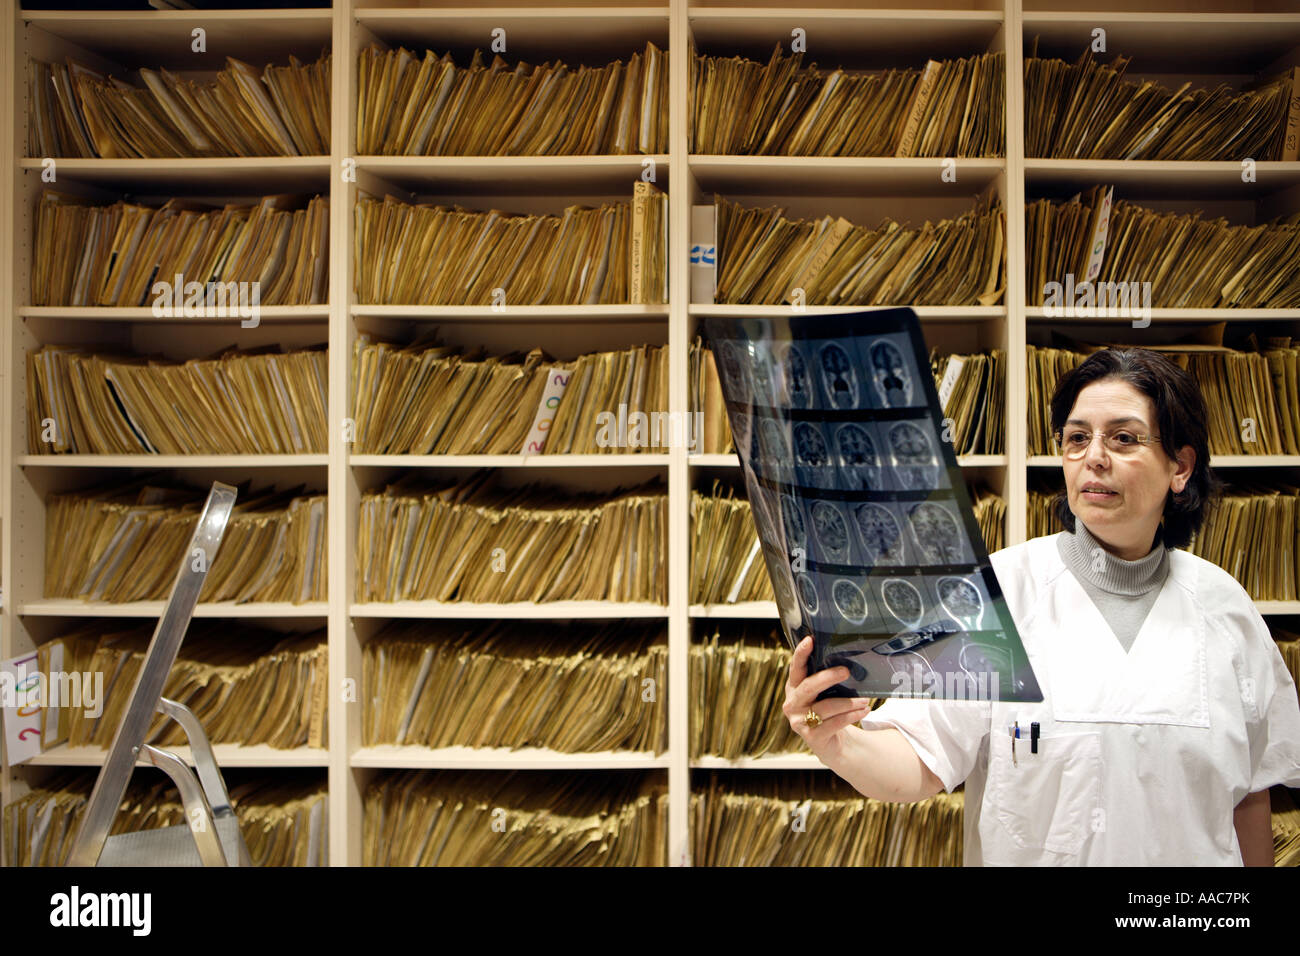 Altona children s hospital The archive of the Radiology - Stock Image